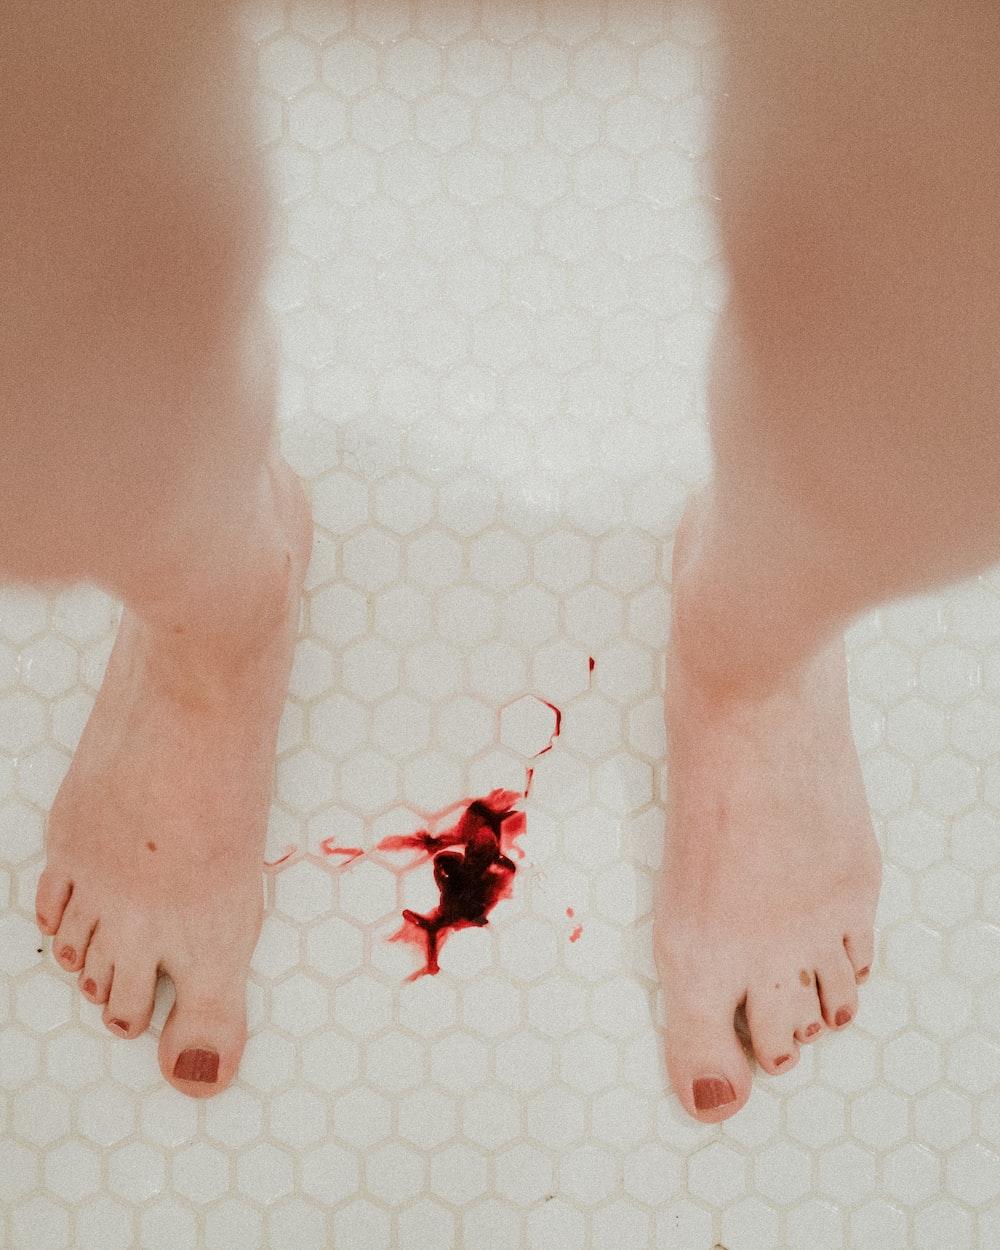 person standing on white ceramic floor tiles